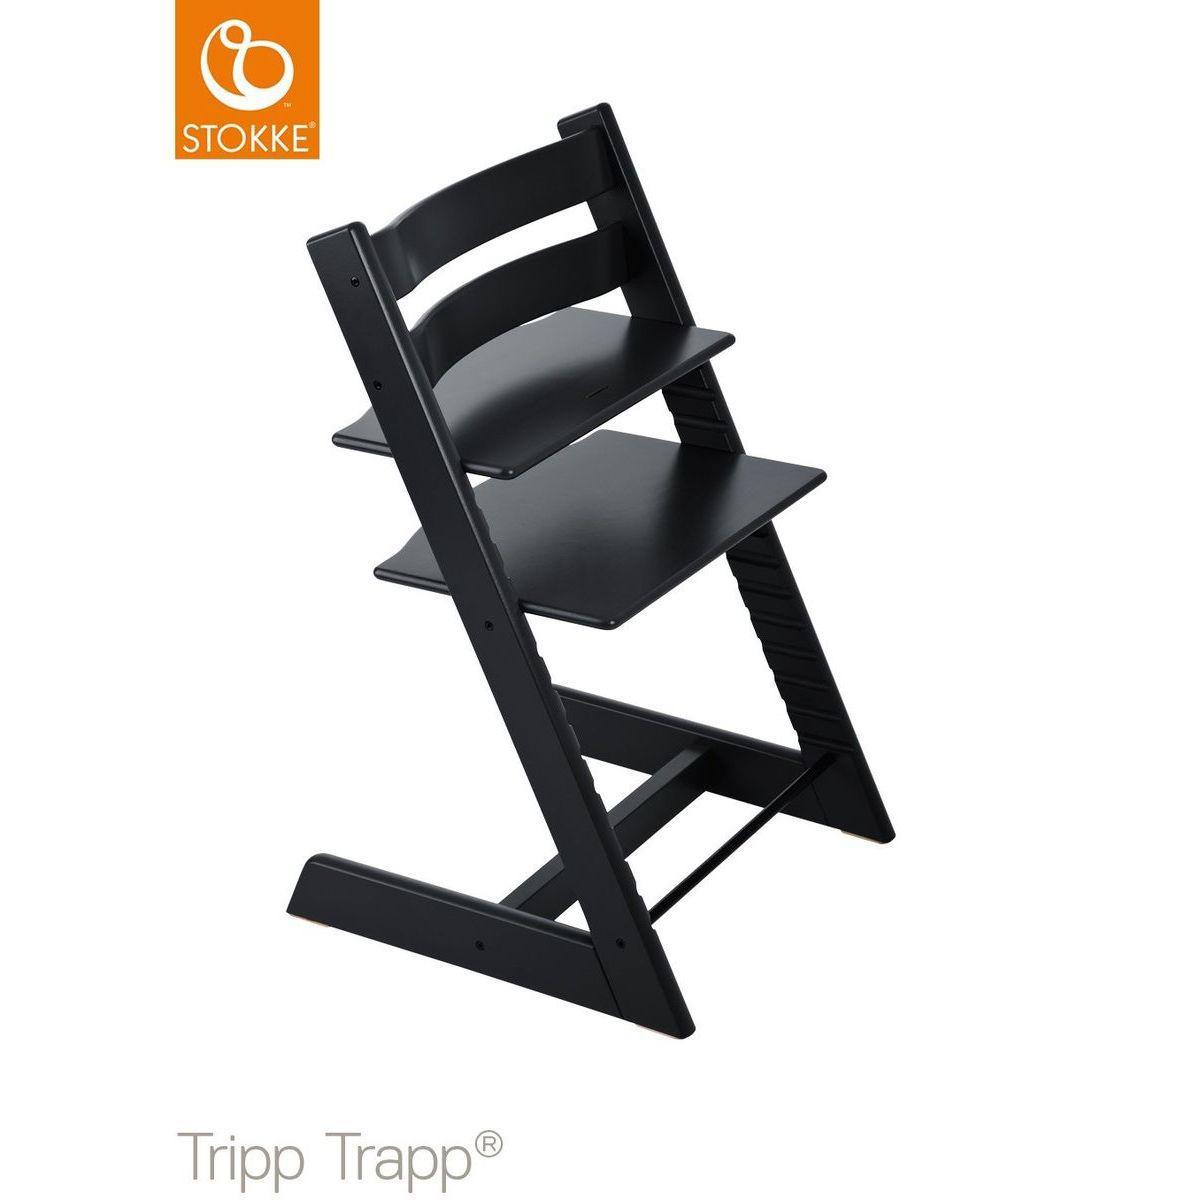 Trona bebé TRIPP TRAPP Stokke negro